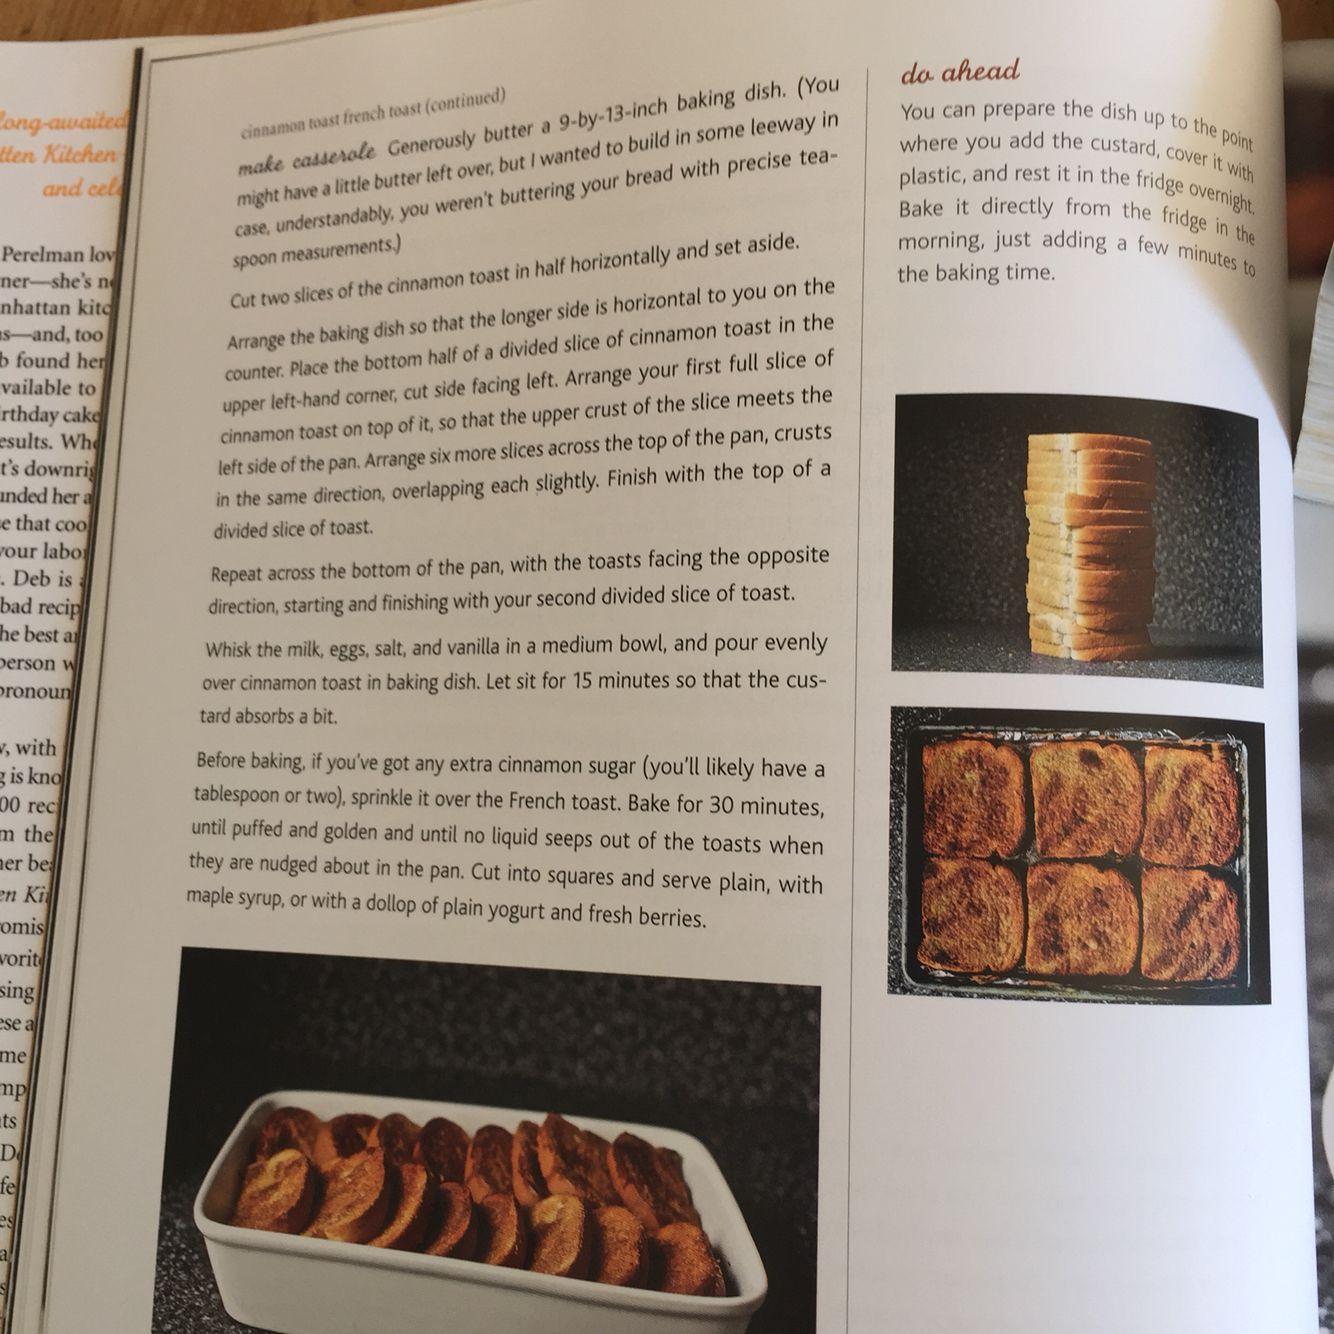 Cinnamon Toast French Smitten Kitchen Part 2 Baked Dishes Breakfast Recipes